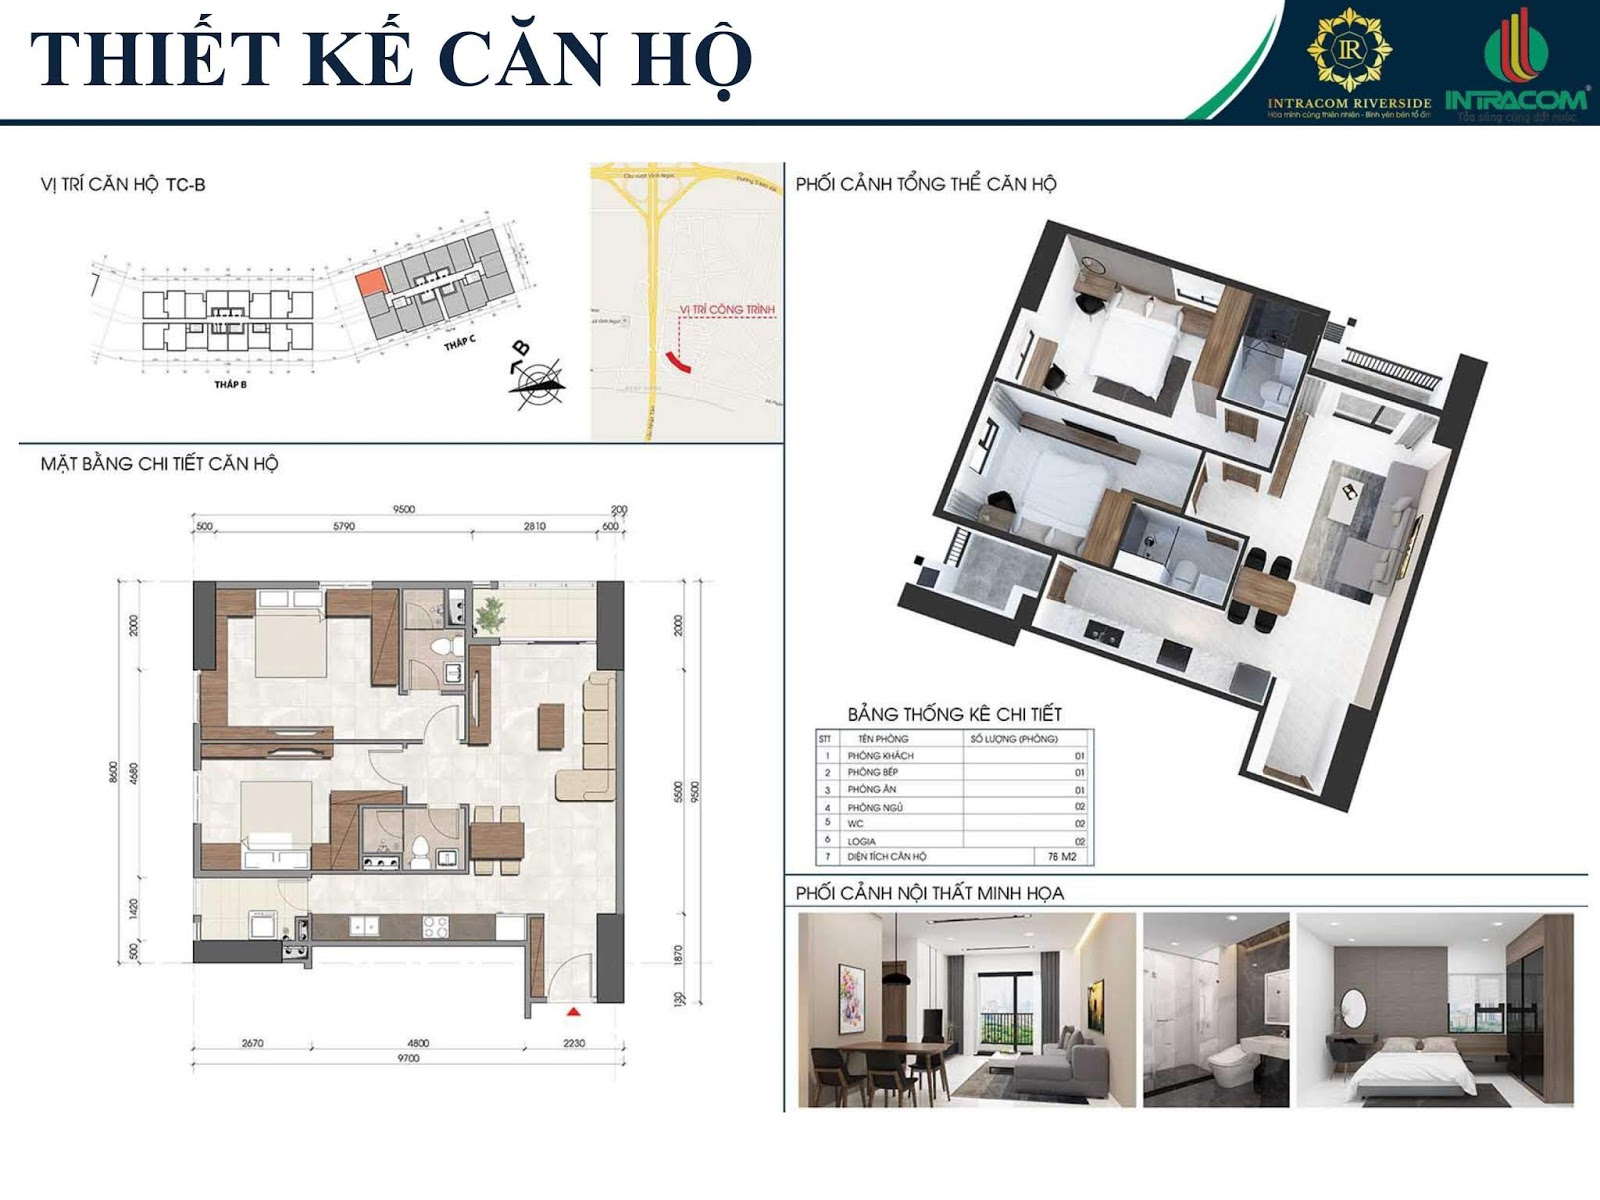 Thiết kế căn 01 - 06 - 08 - 12A - 76m2